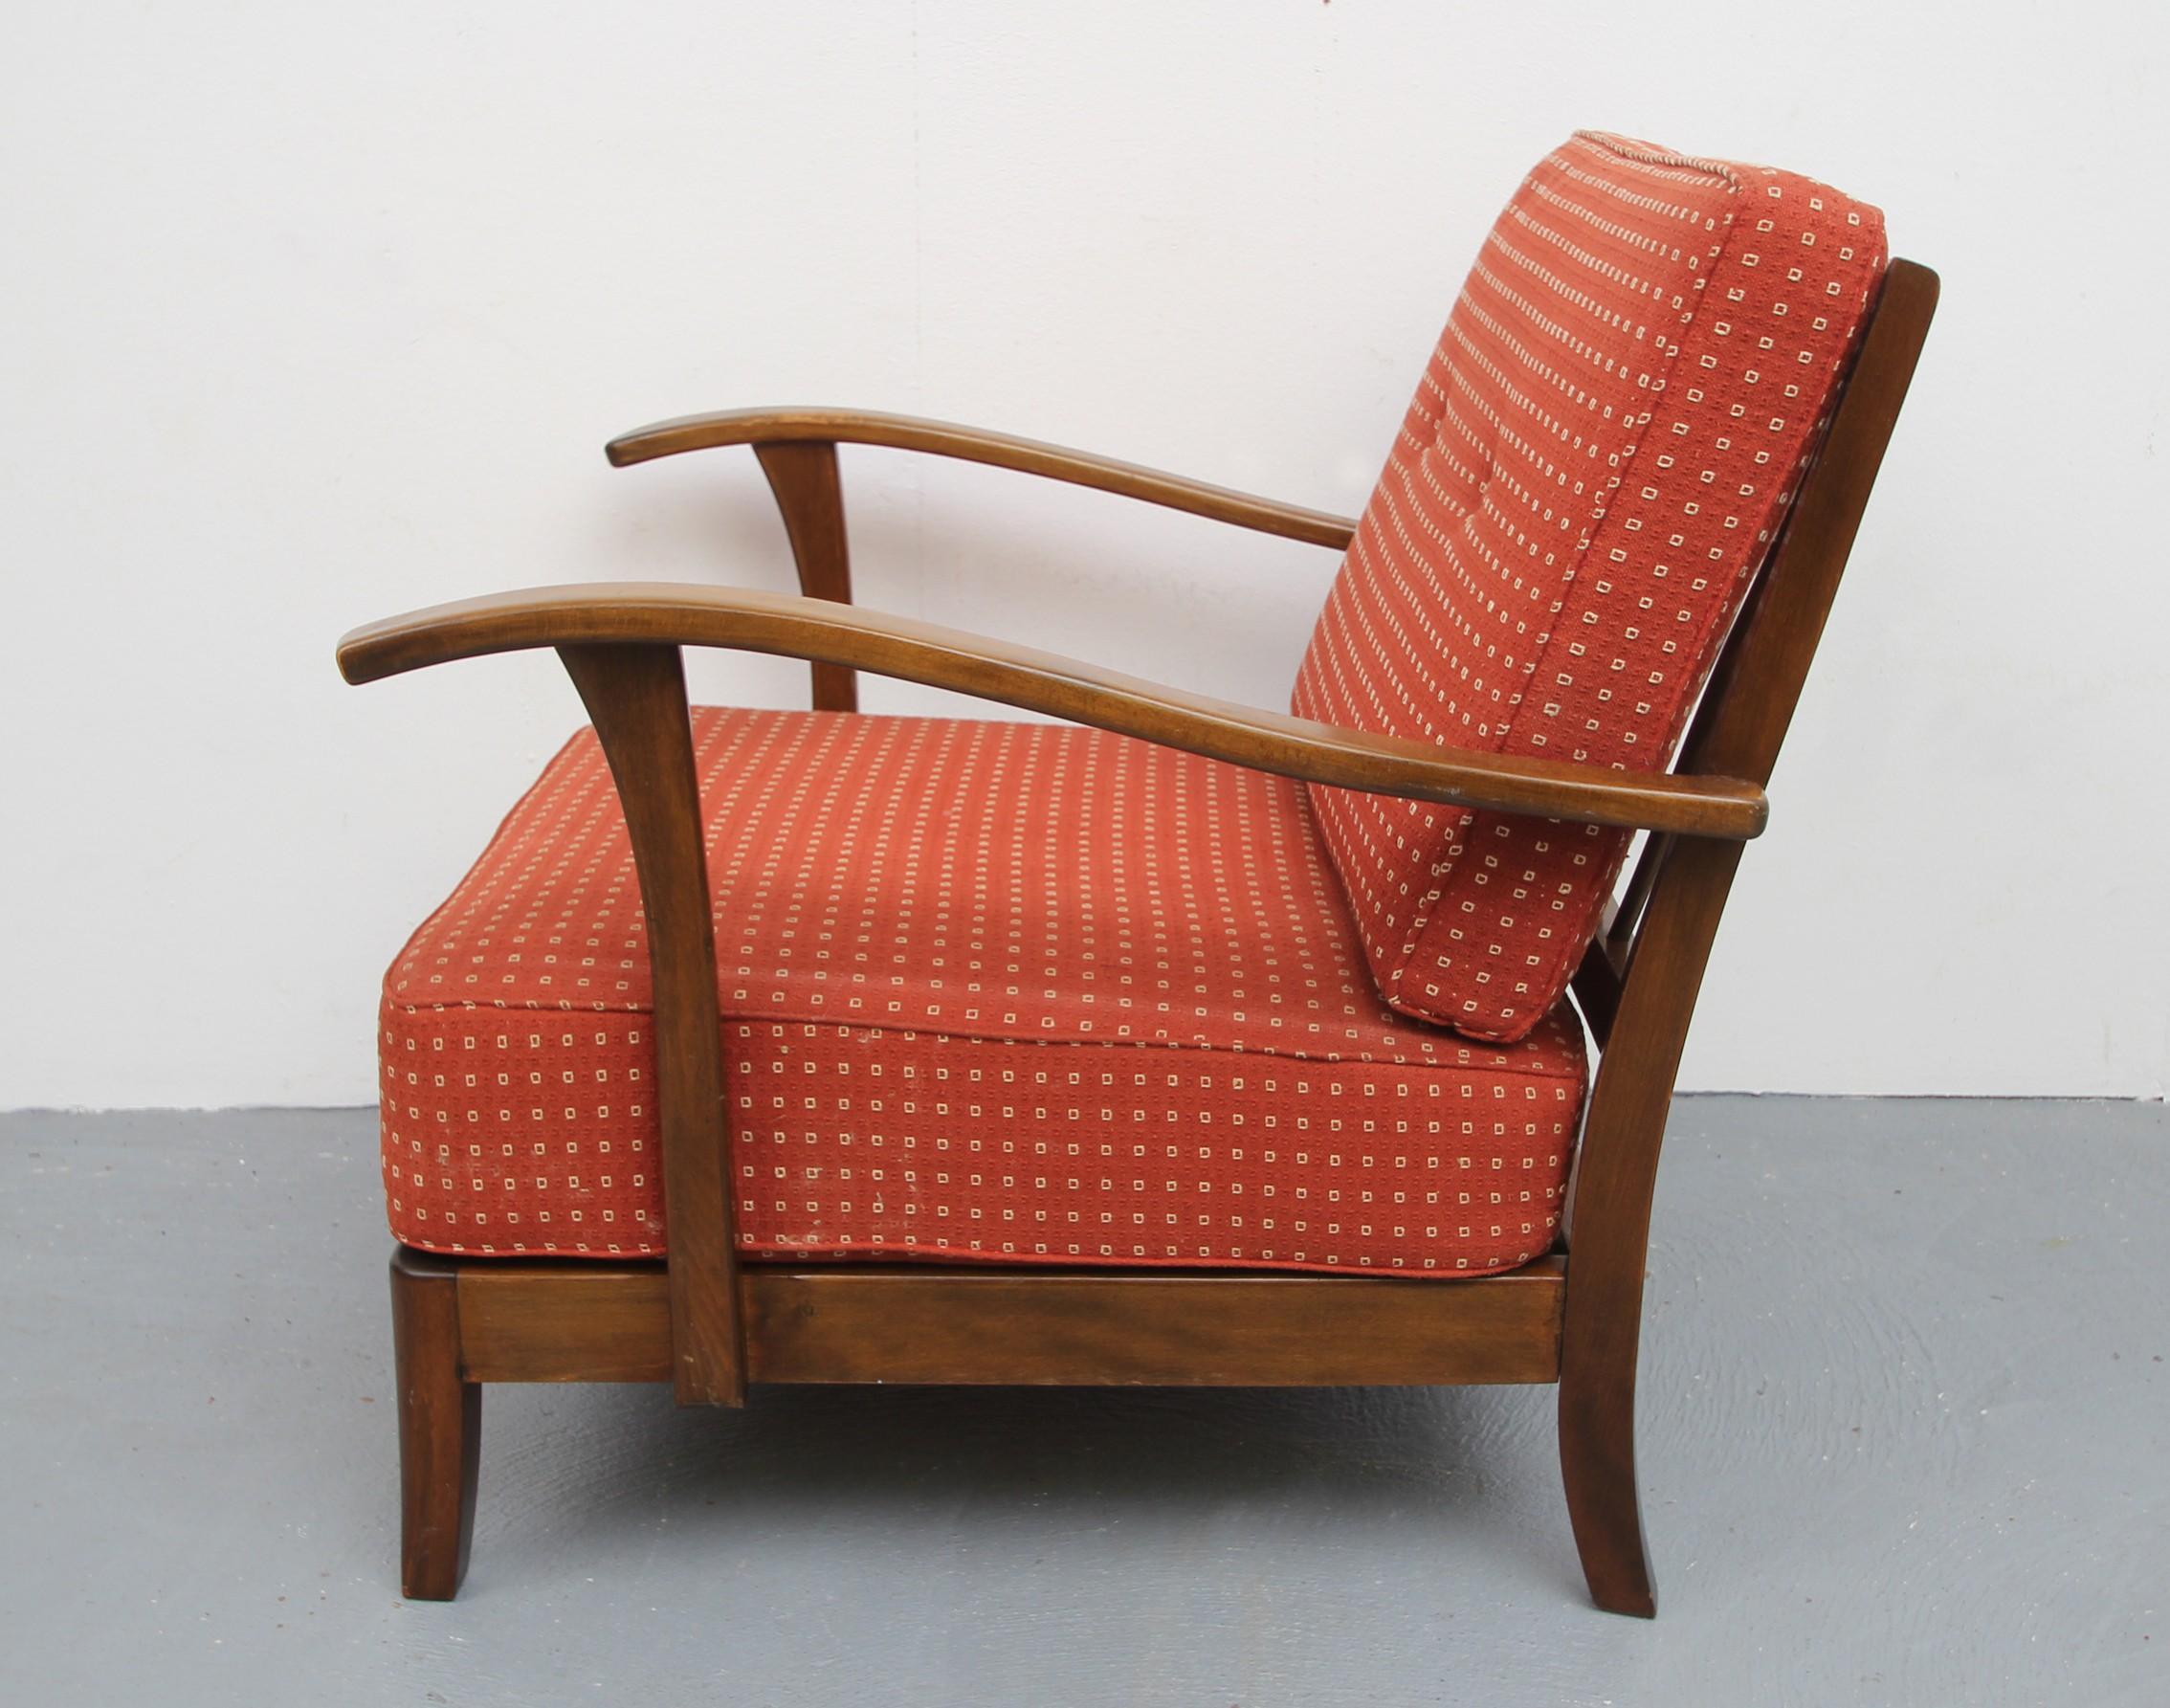 Vintage armchair in pale red 1930s Design Market